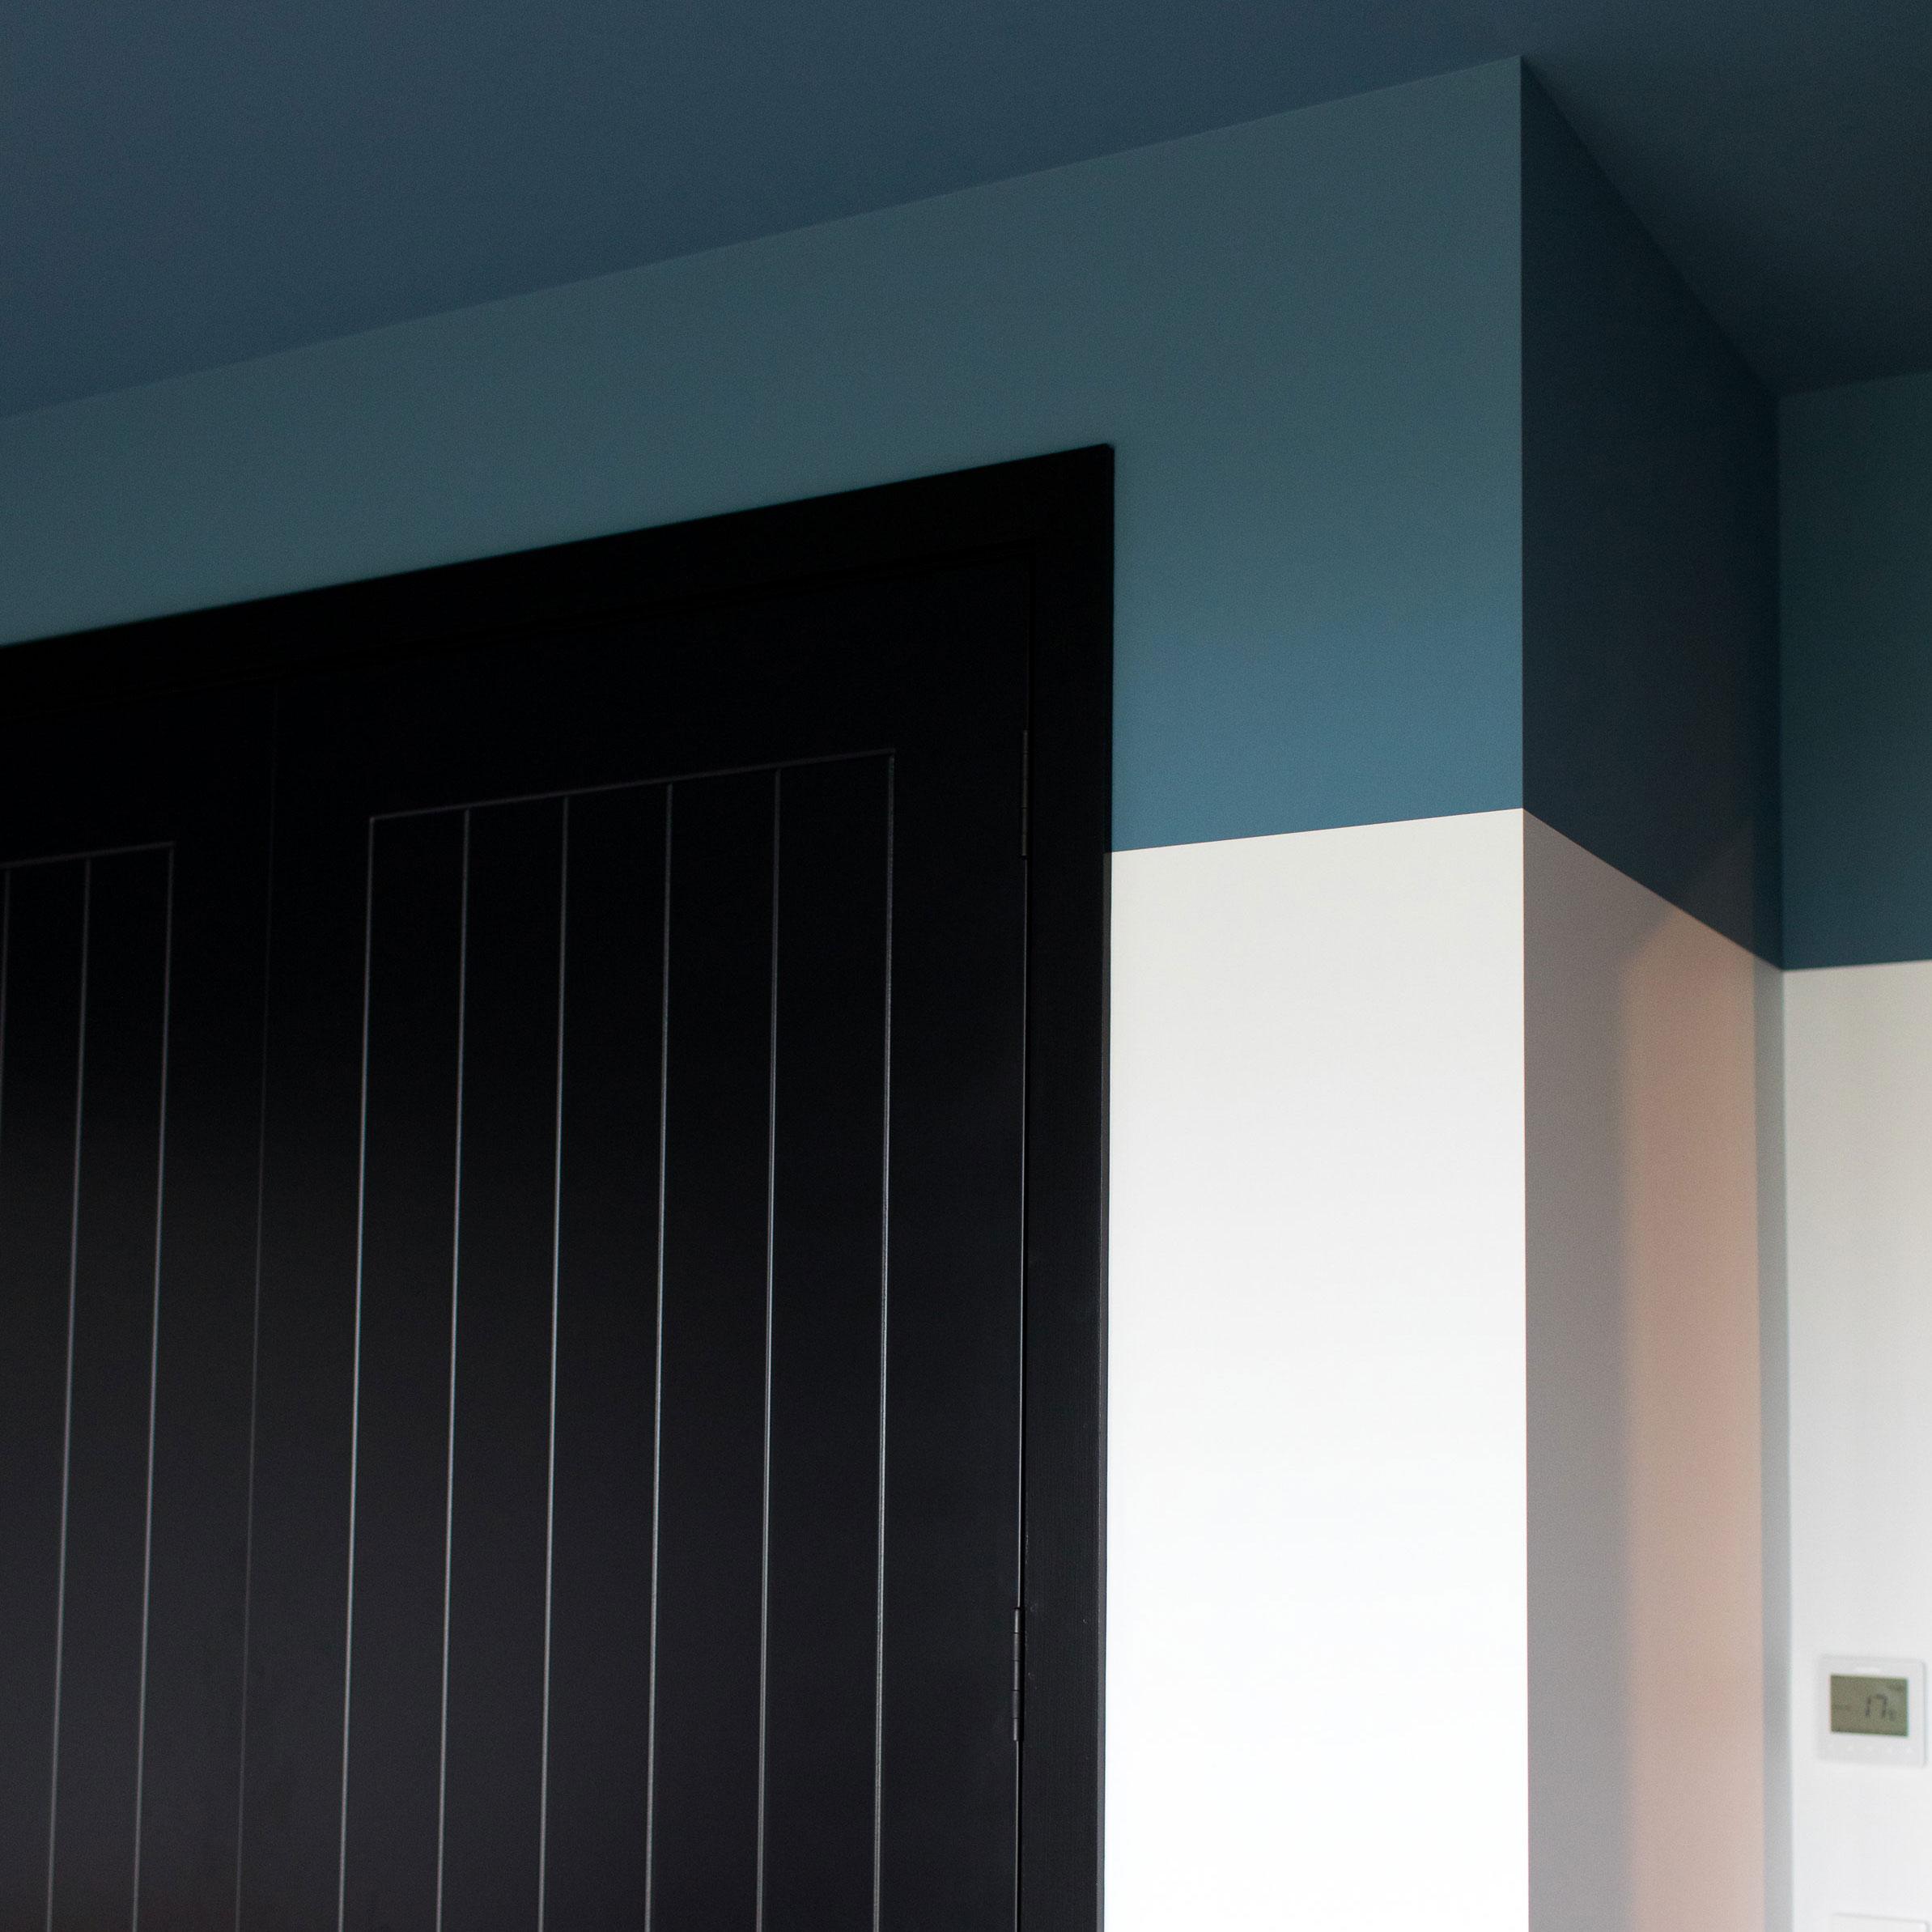 Design-Federation_Jakes-Room-2_McMillan-House-10.jpg